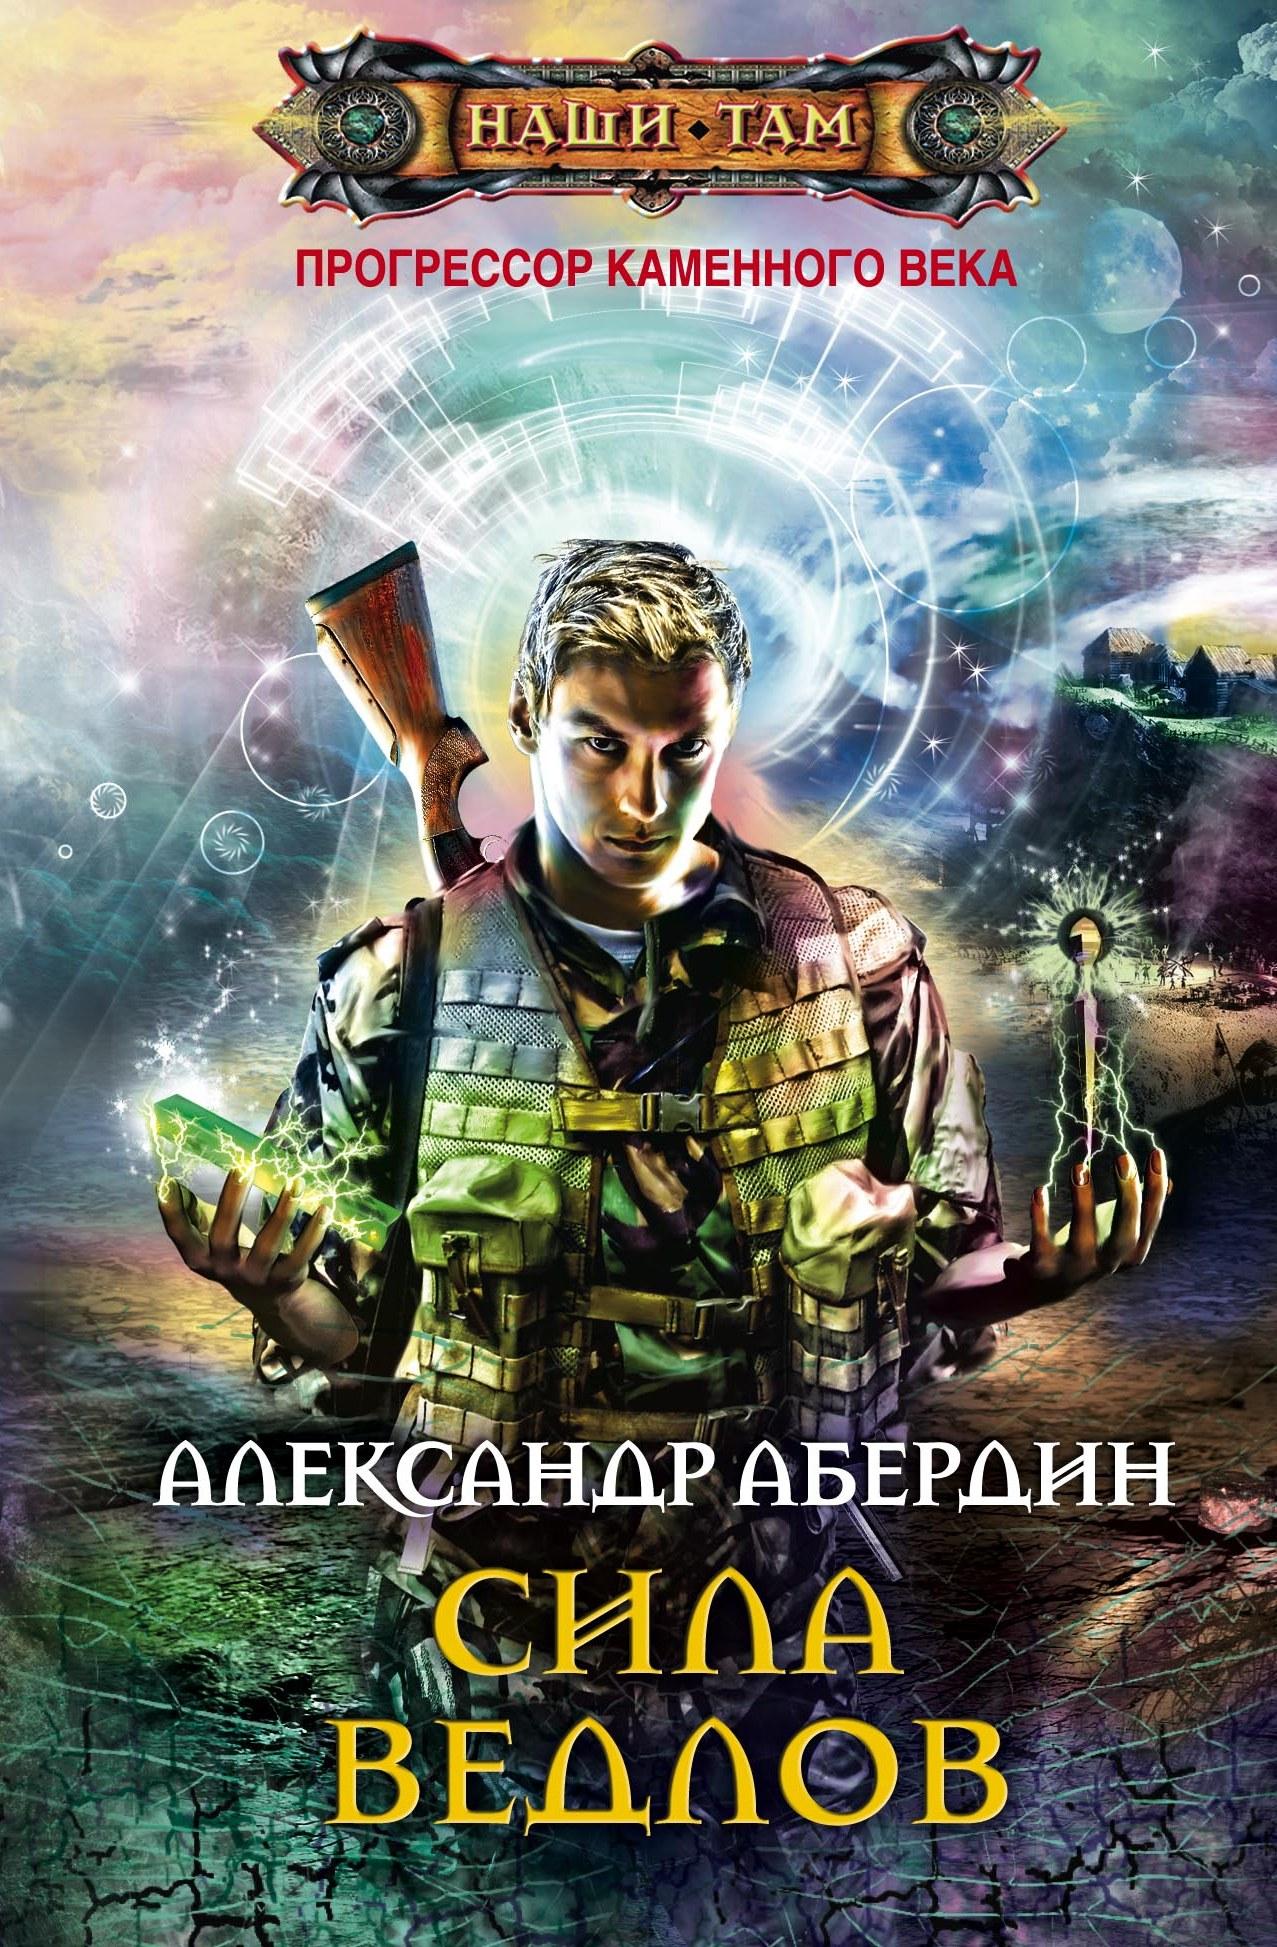 АБЕРДИН АЛЕКСАНДР КНИГИ СКАЧАТЬ БЕСПЛАТНО